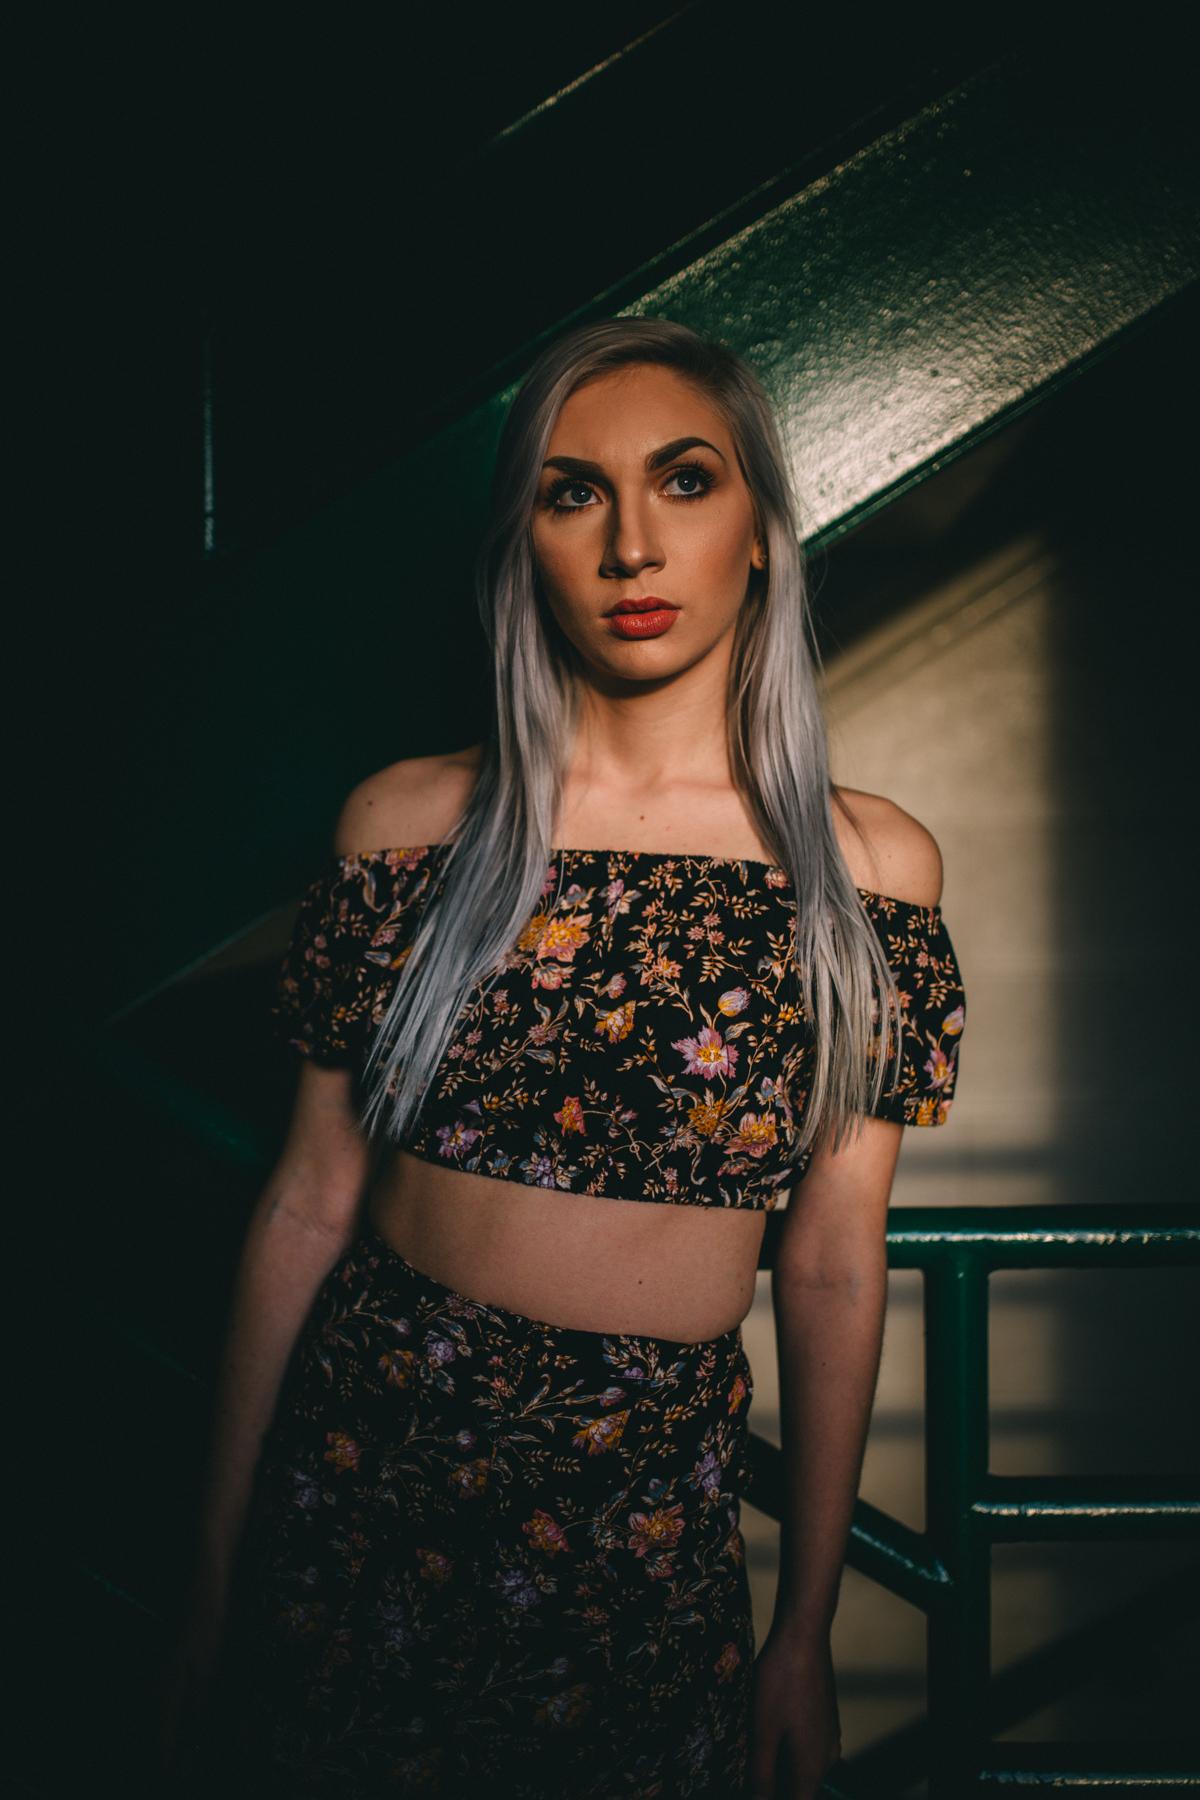 Photographer-portrait-Orlando-lifestyle-fashion